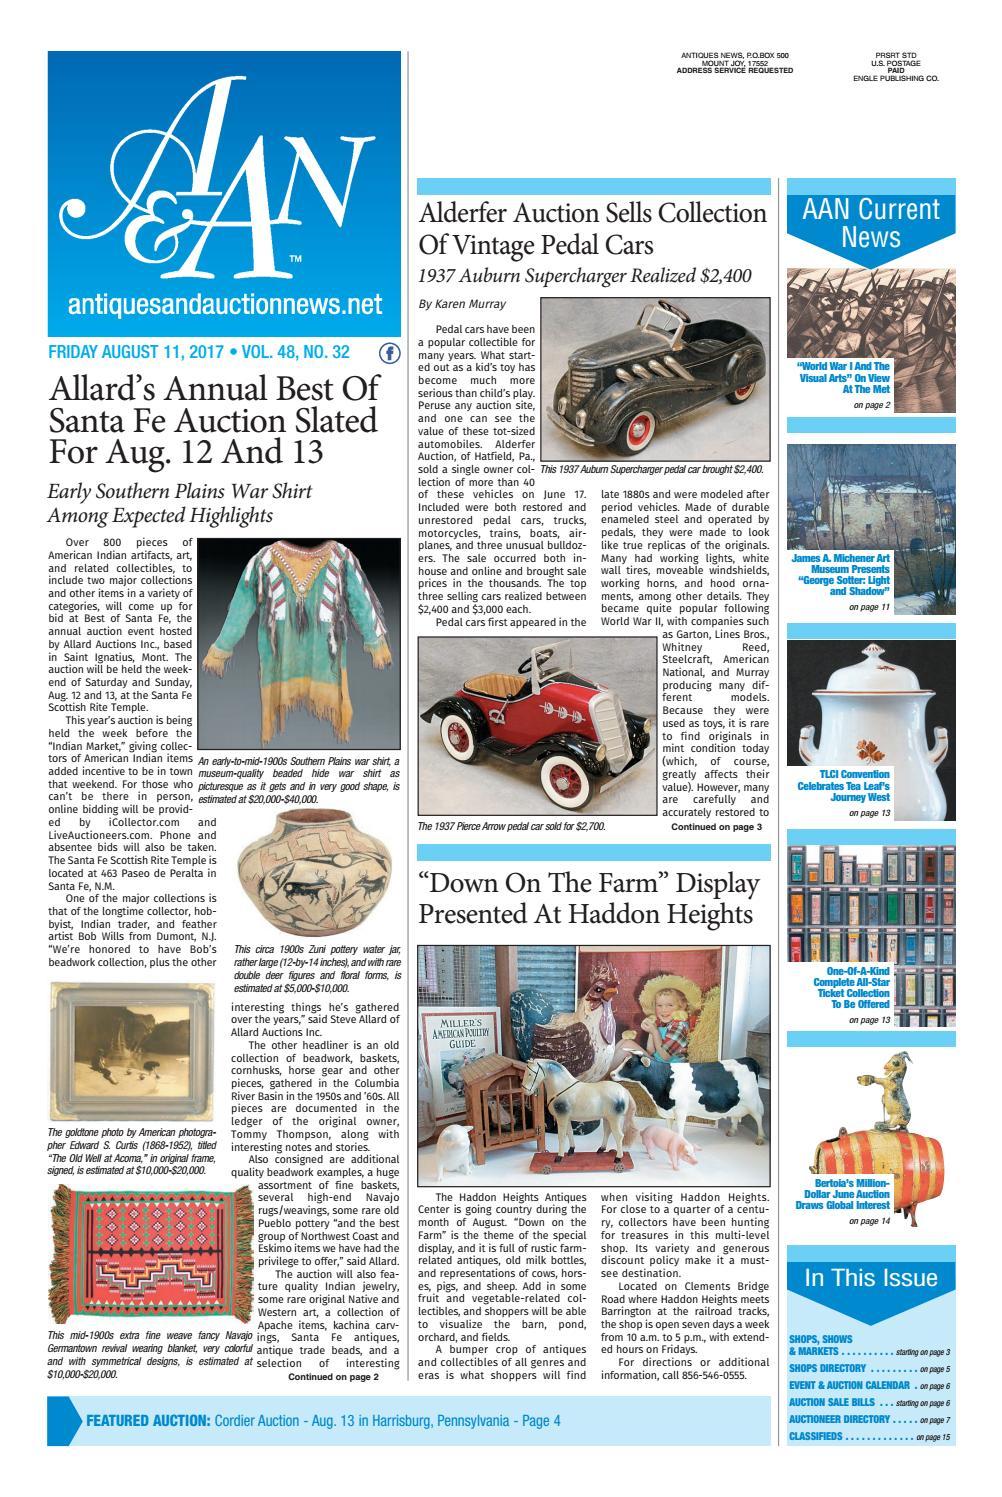 Antiques & Auction News 081117 by Antiques & Auction News